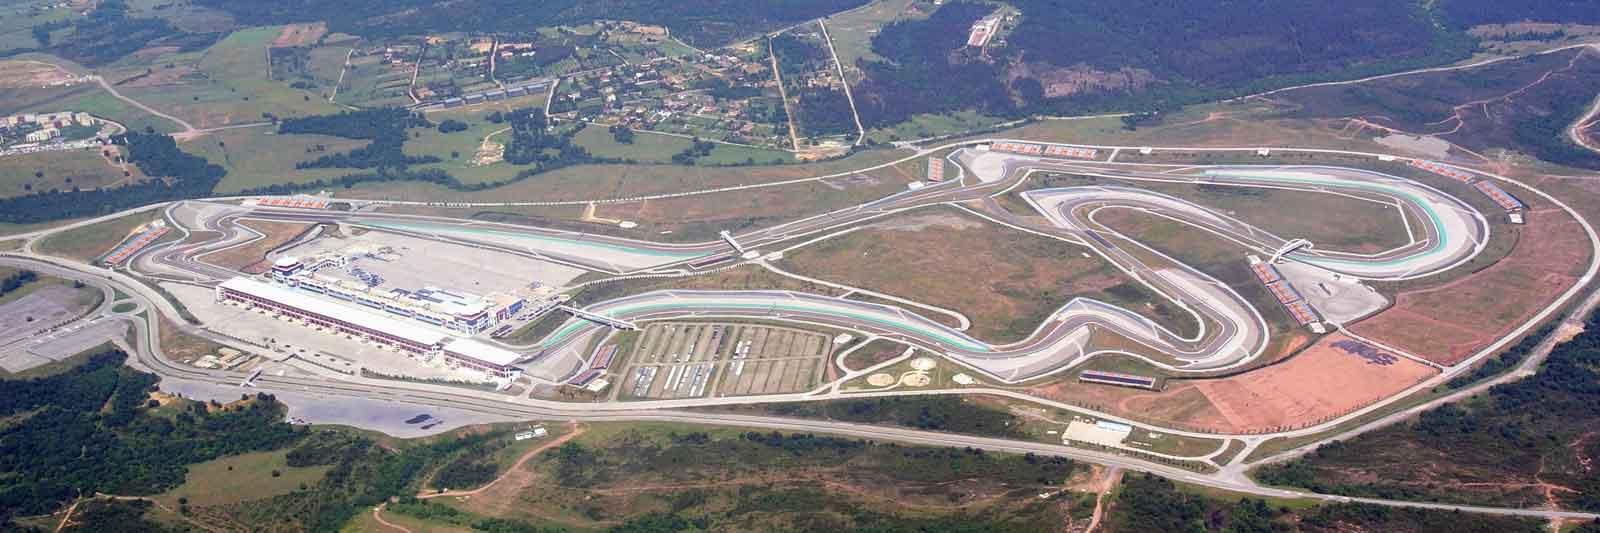 Istanbul Park racing circuit.